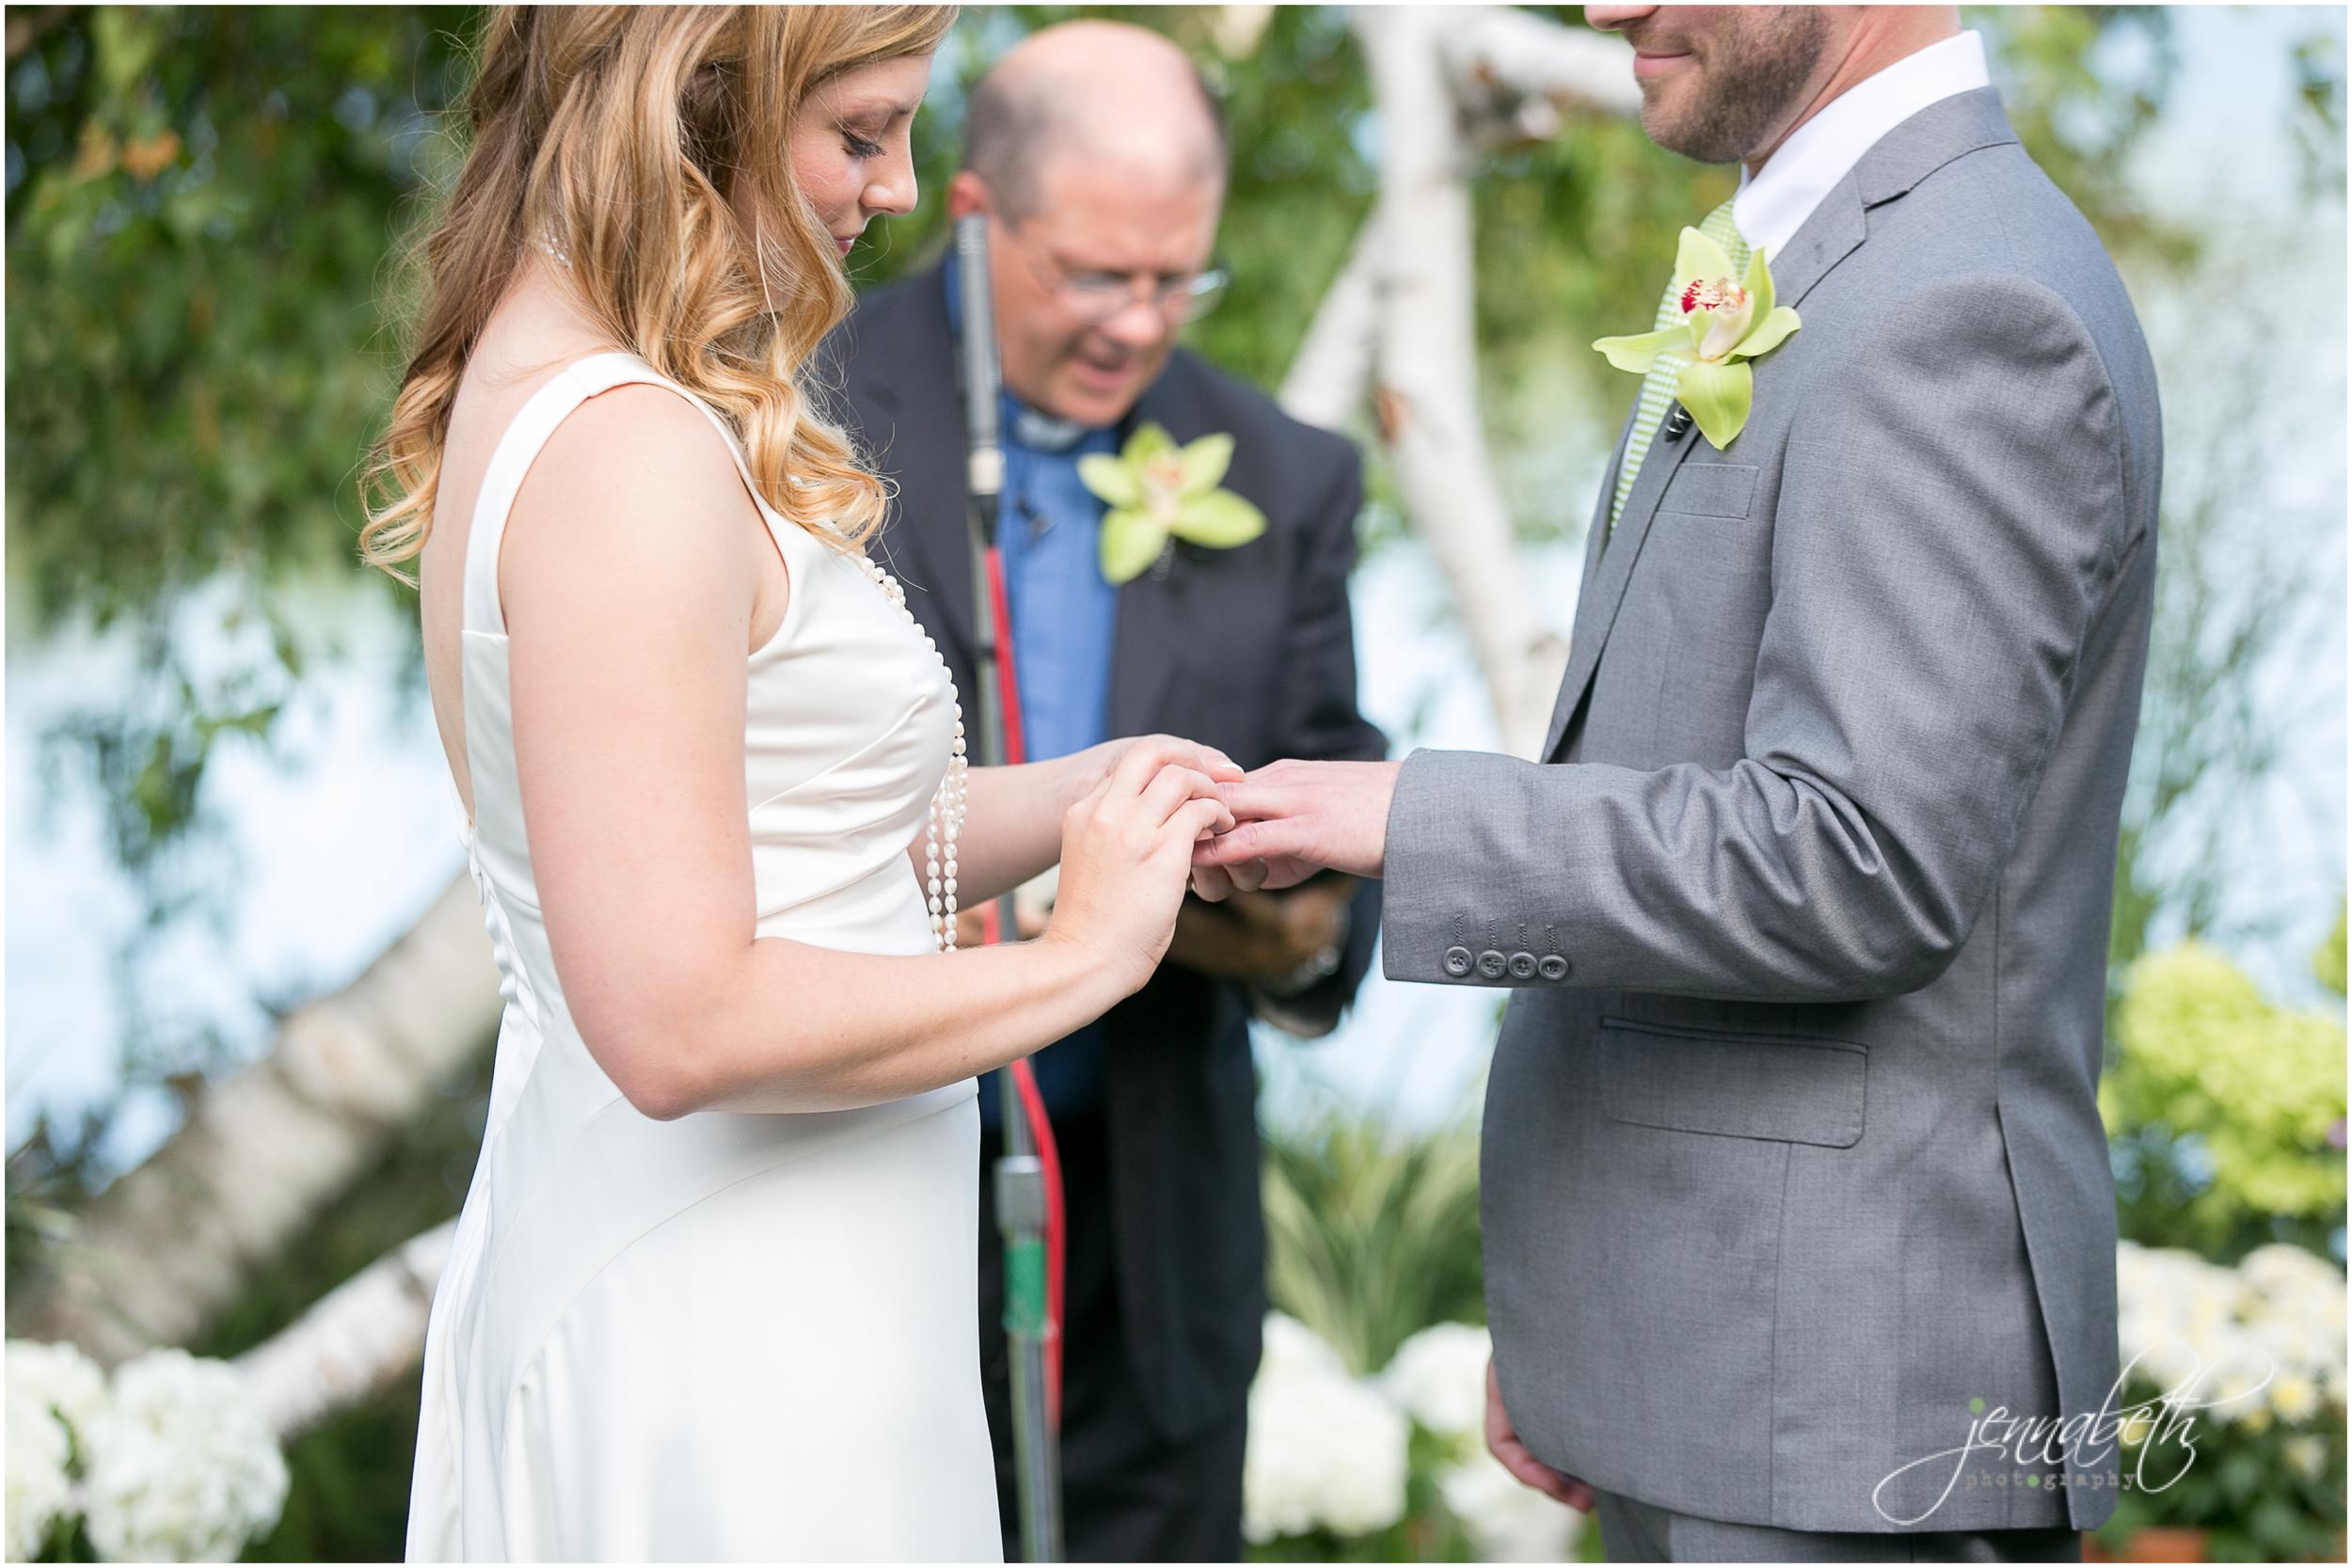 Kelly + Brian Wedding - Destination Minneapolis Lake Wedding ...